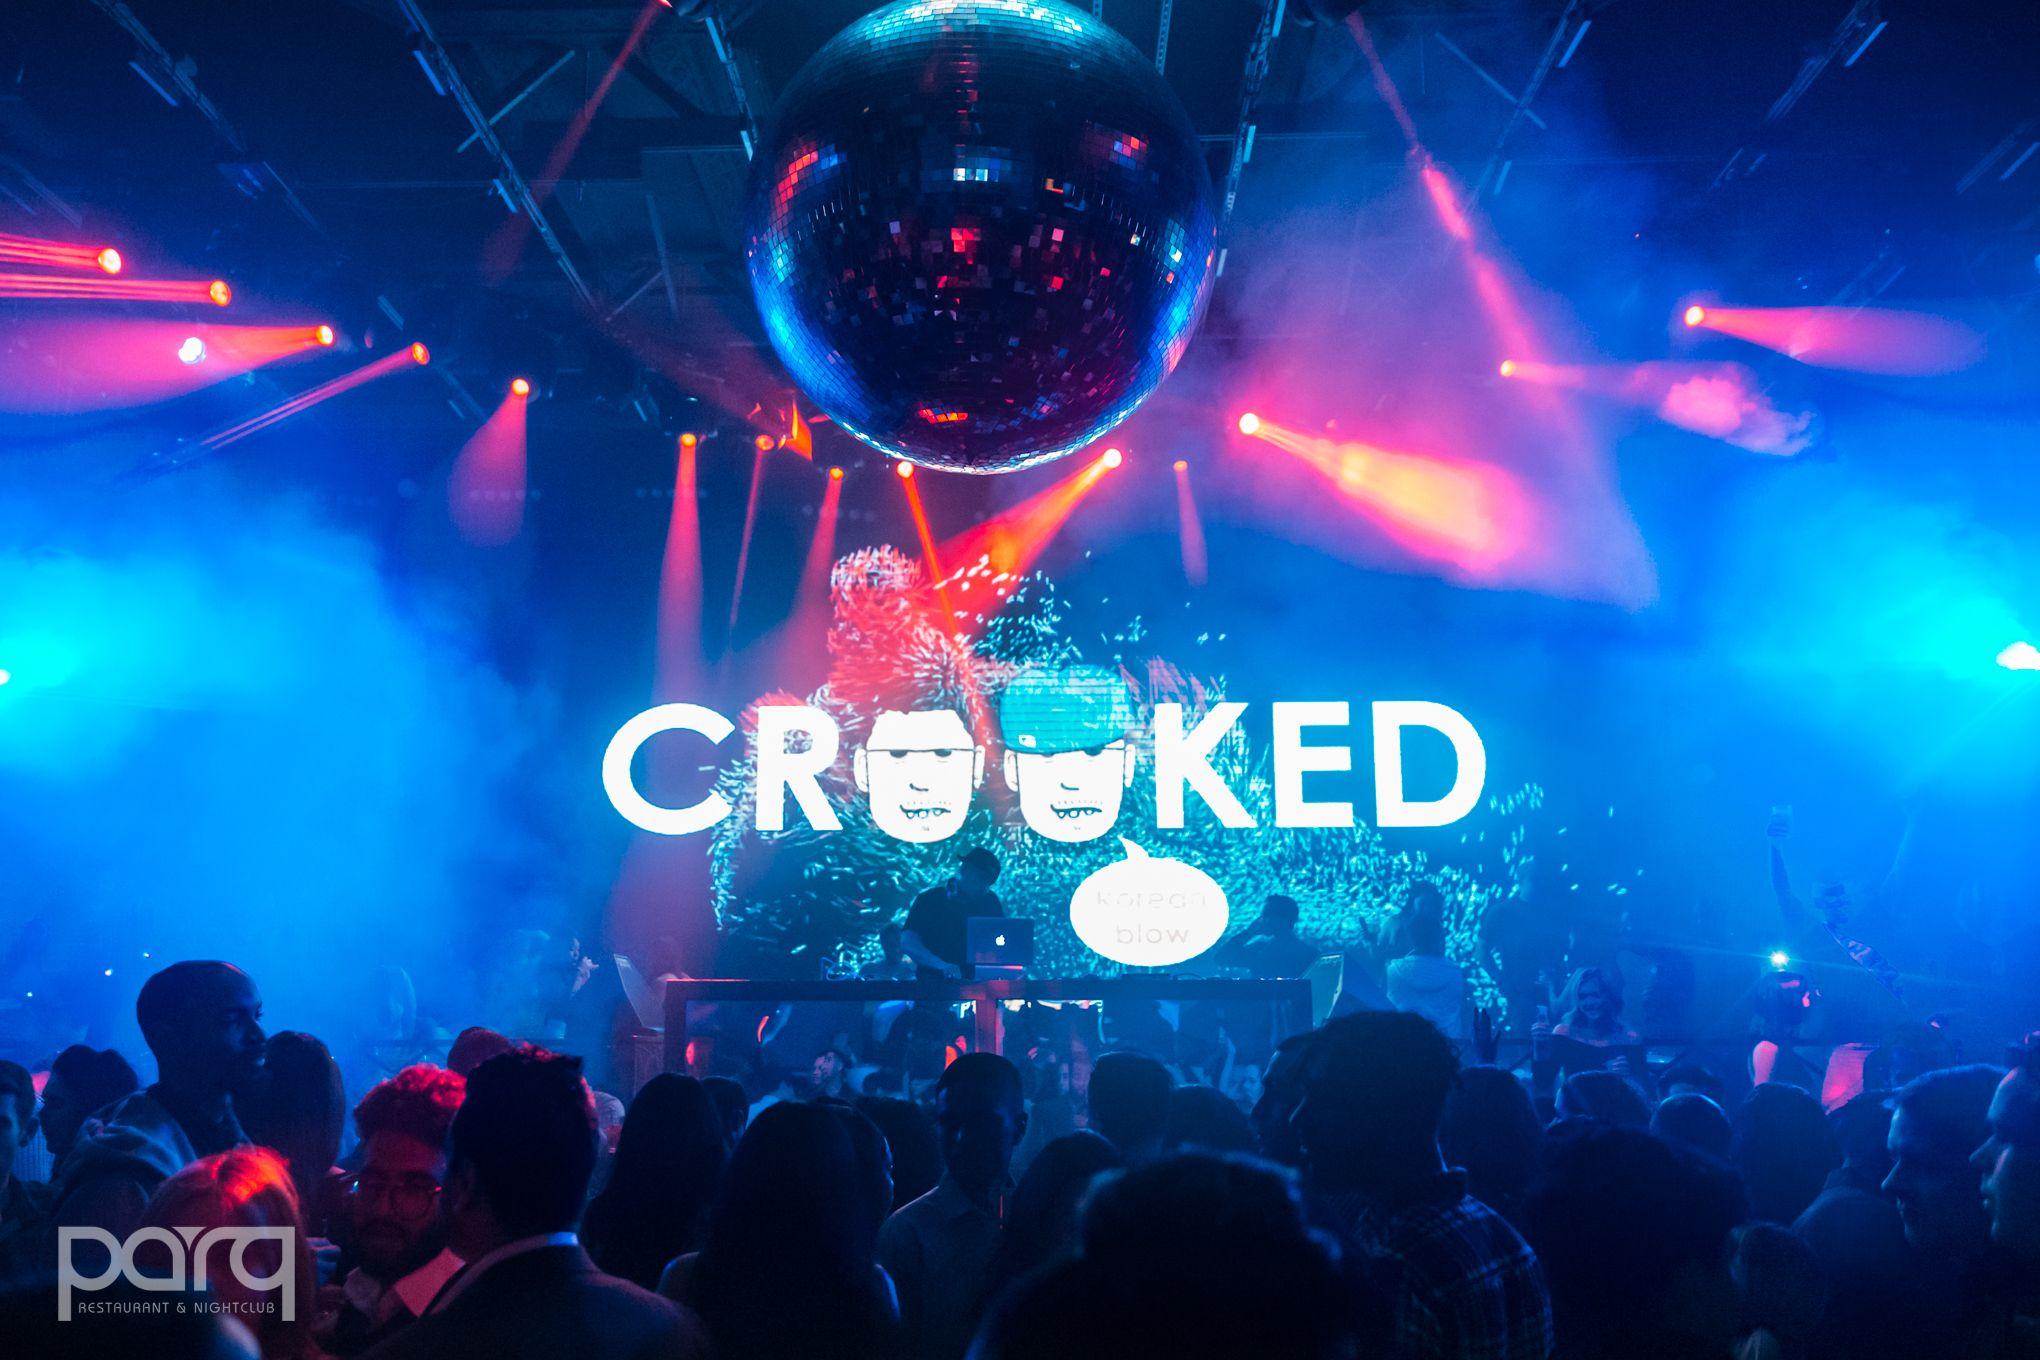 01.19.19 Parq - Crooked-9.jpg